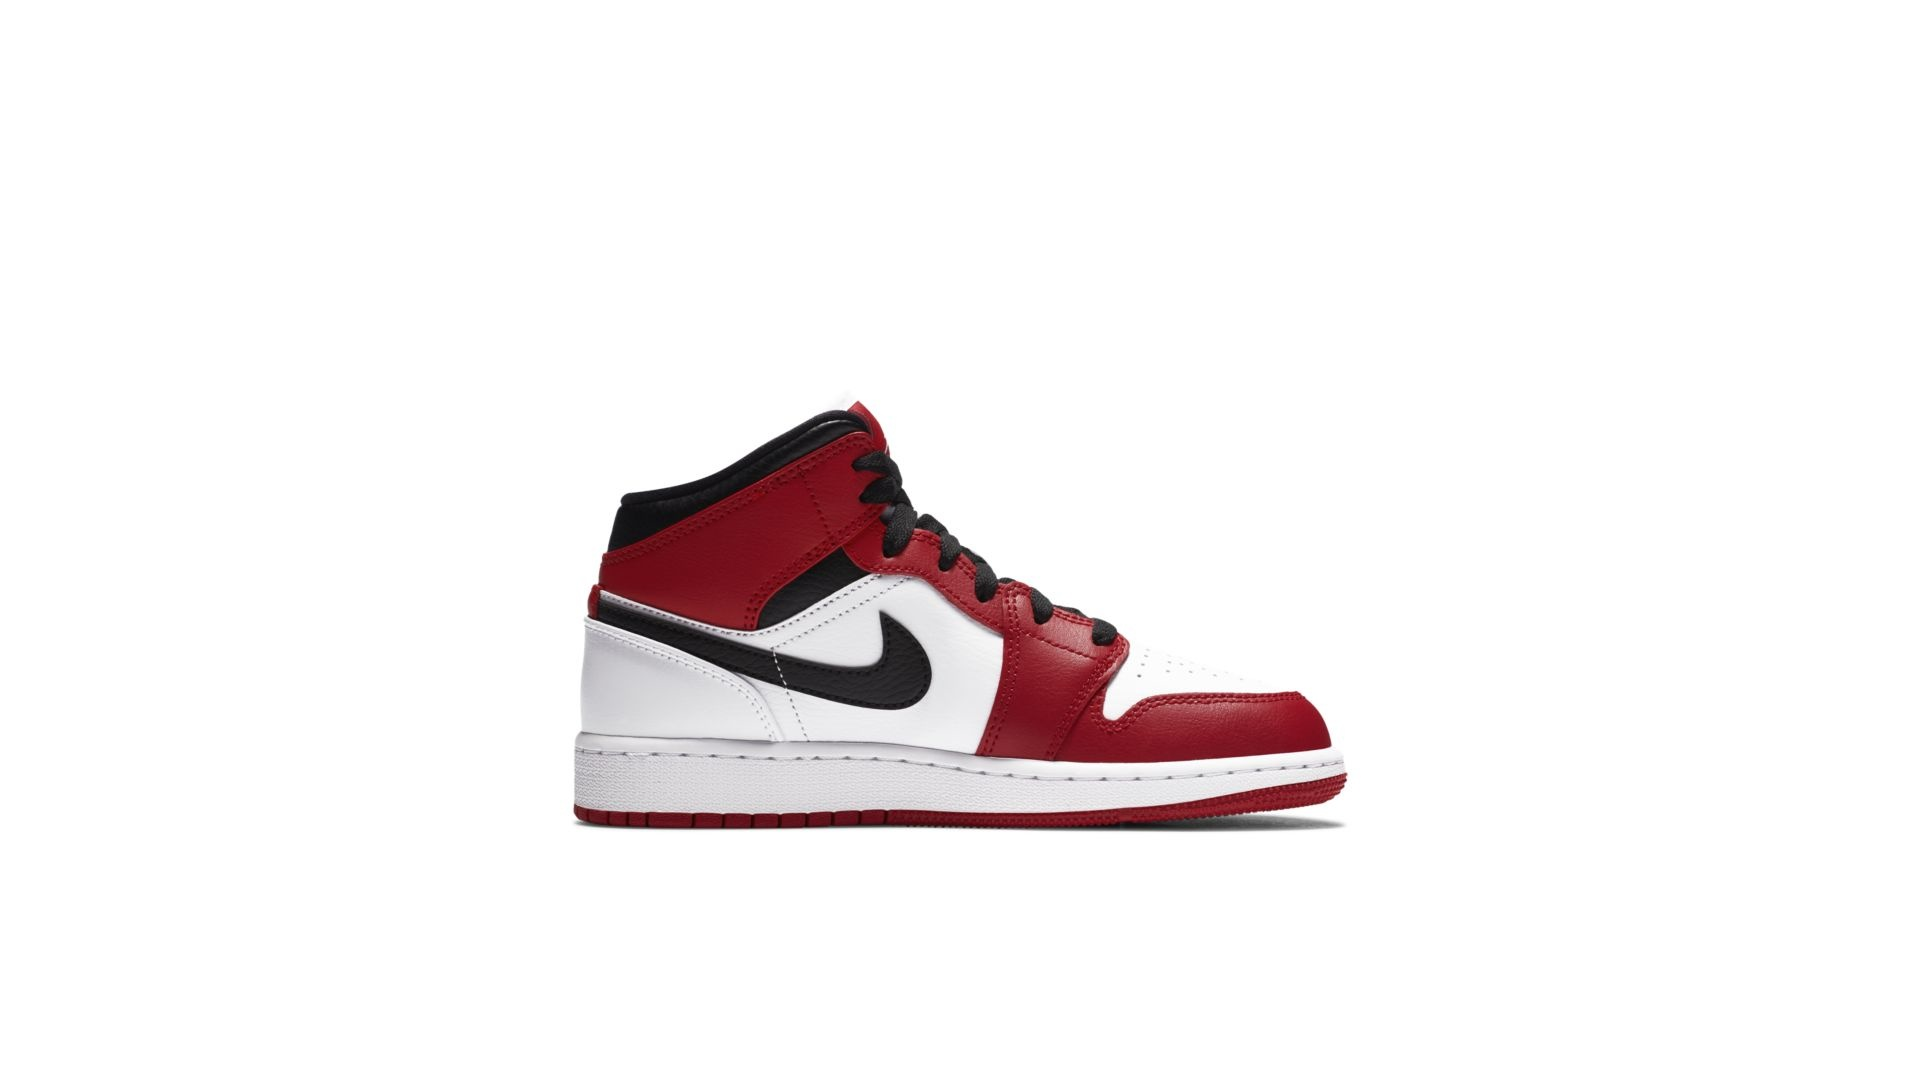 Jordan Air Jordan 1 Mid 'Chicago' (2020) (GS)